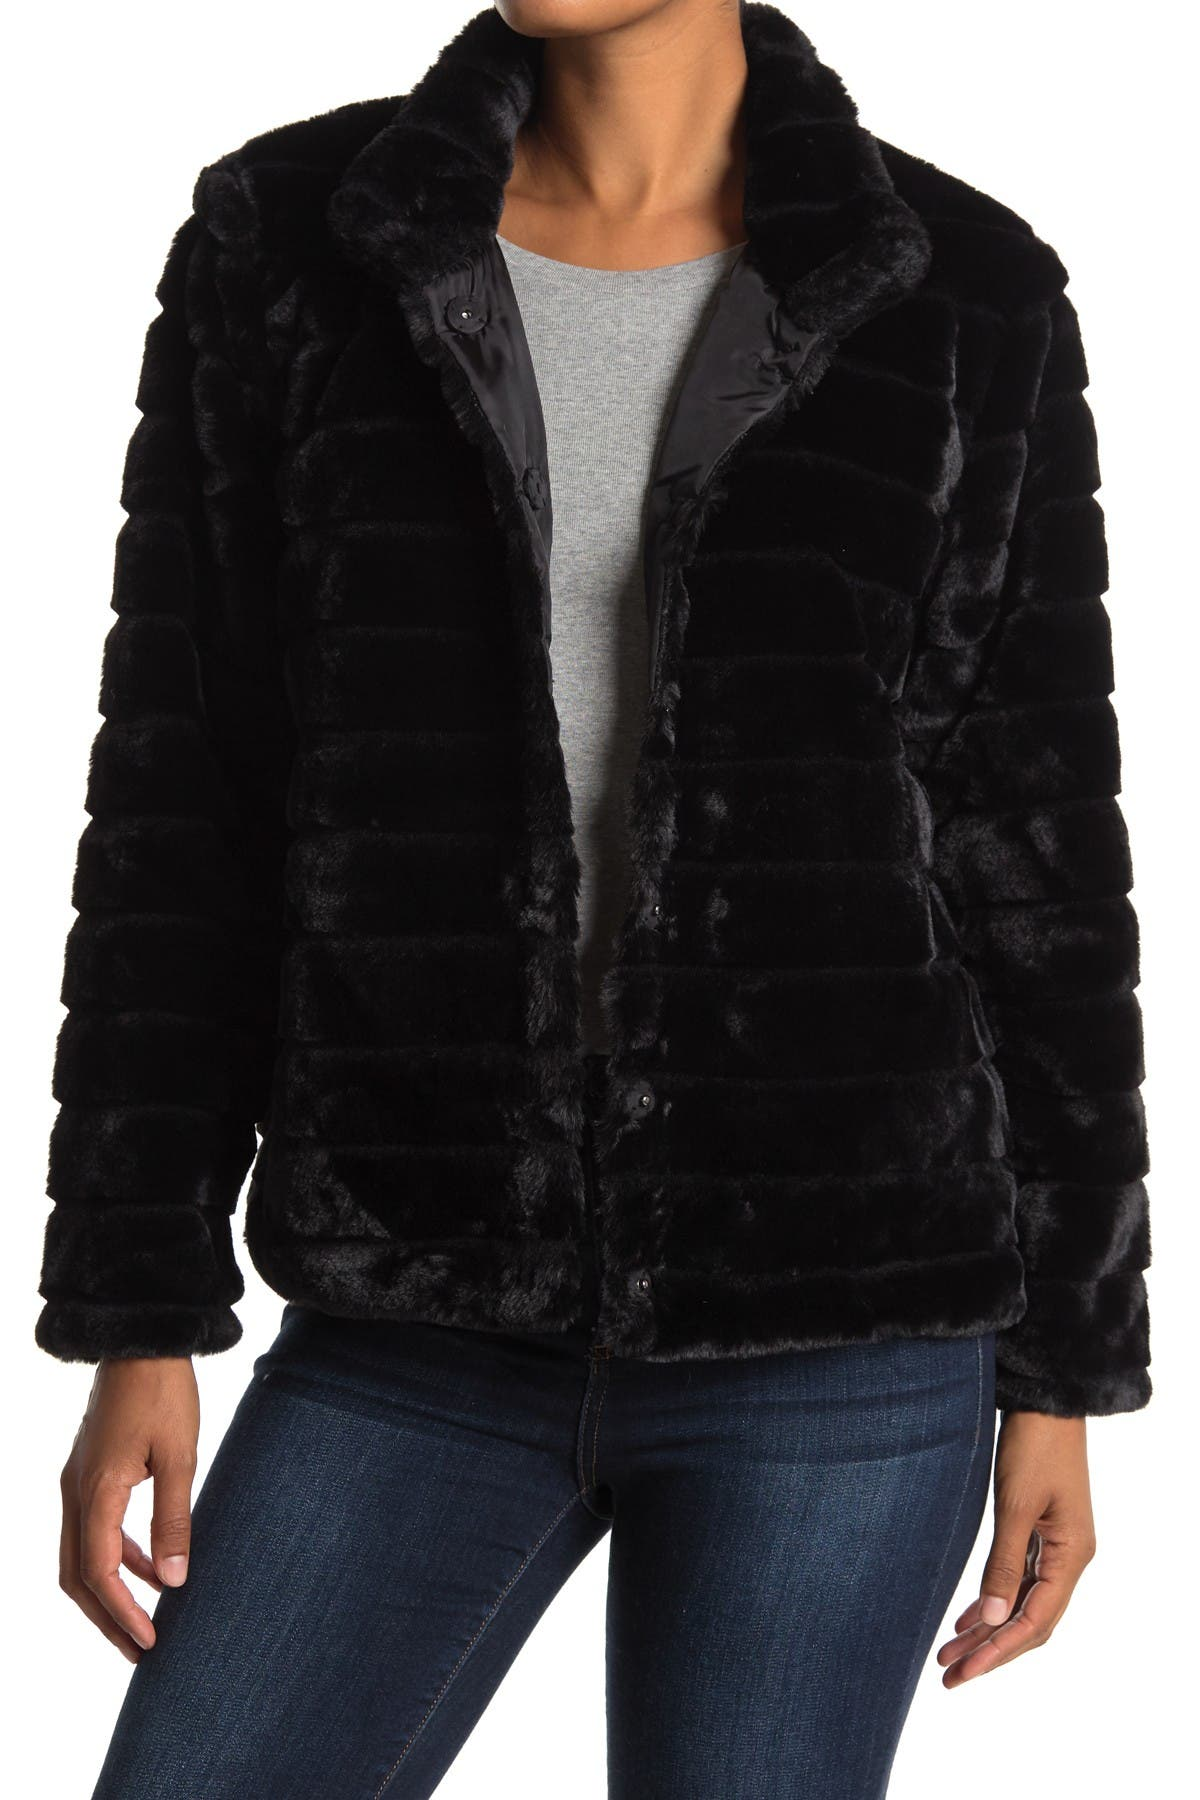 Image of Woven Heart Faux Fur Coat